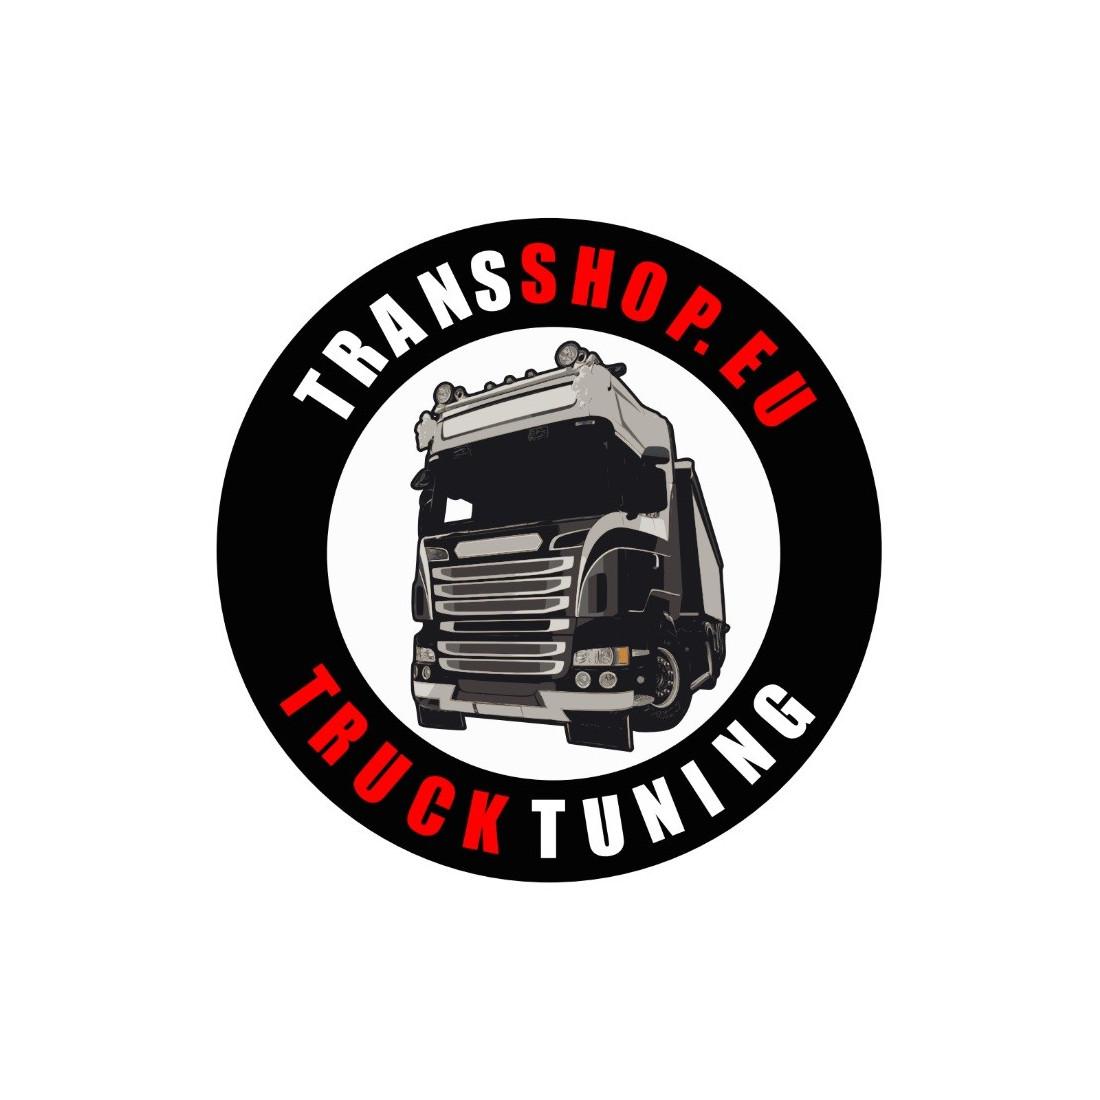 TRANSSHOP NAKLEJKA WLEPA 10 CM